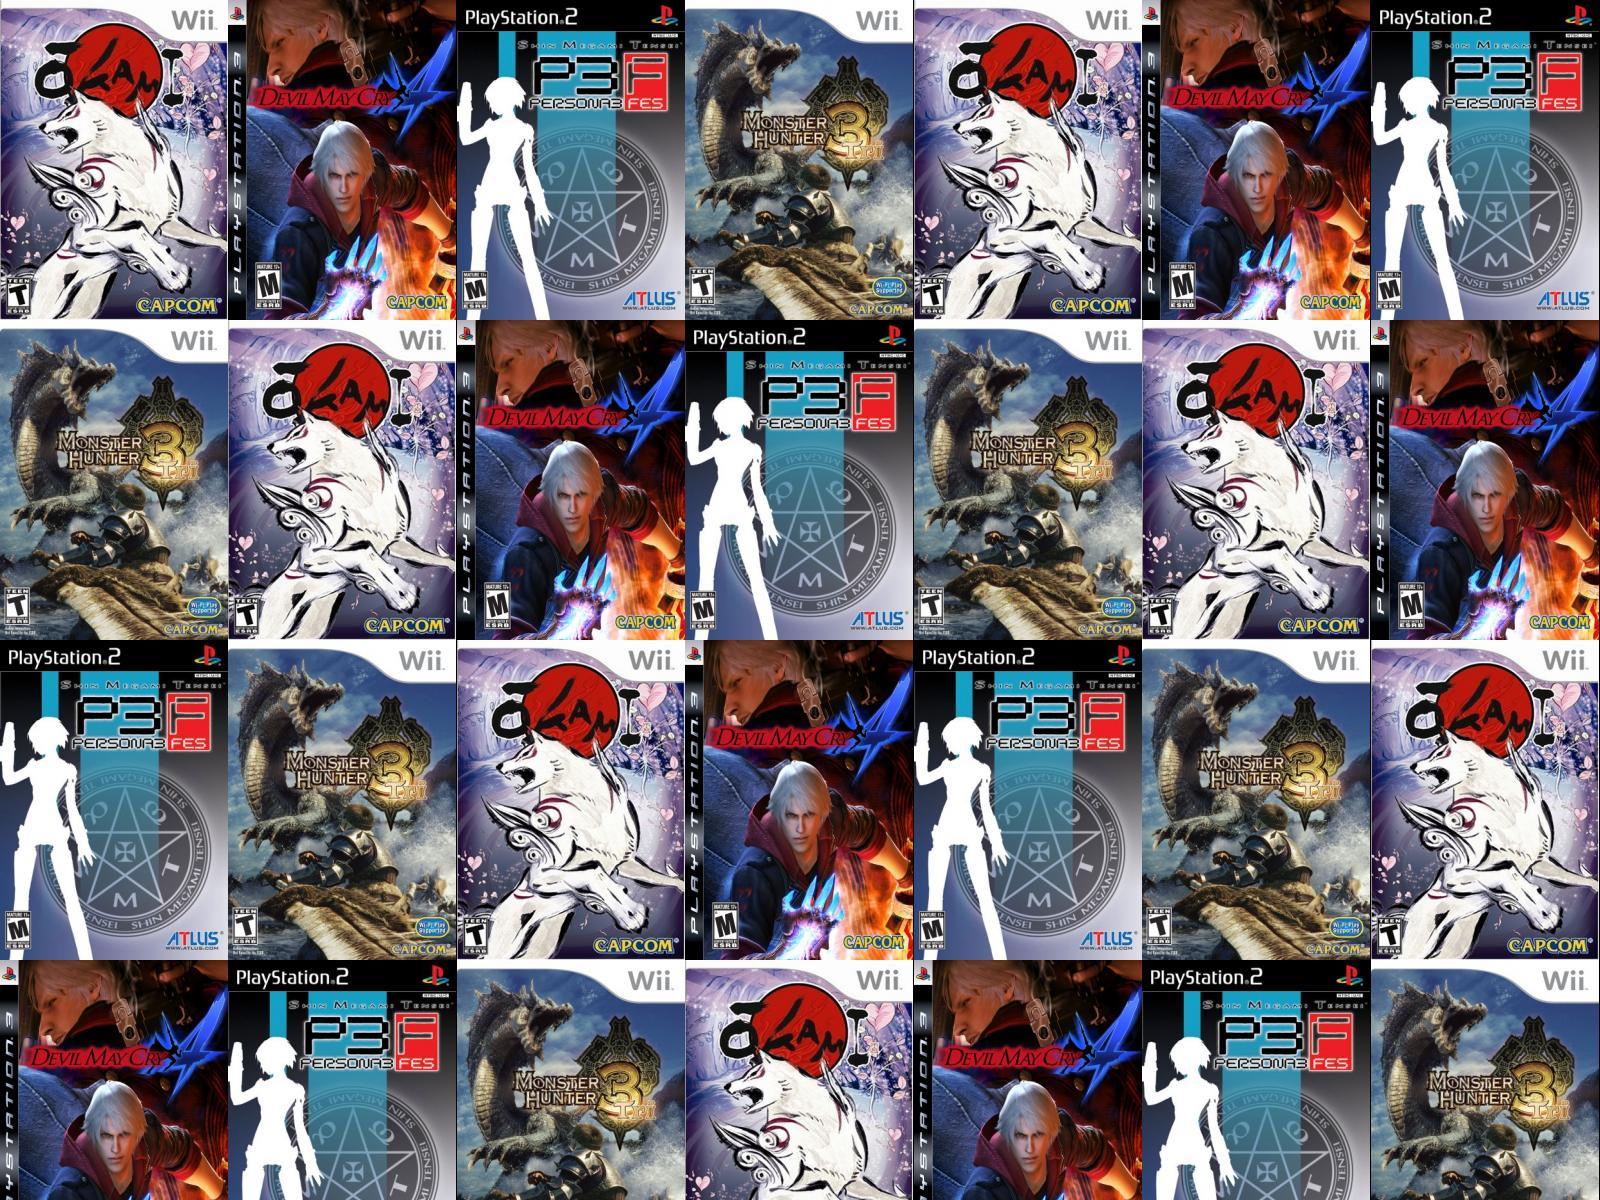 Okami Devil May Cry 4 Persona 3 FES Wallpaper Tiled Desktop